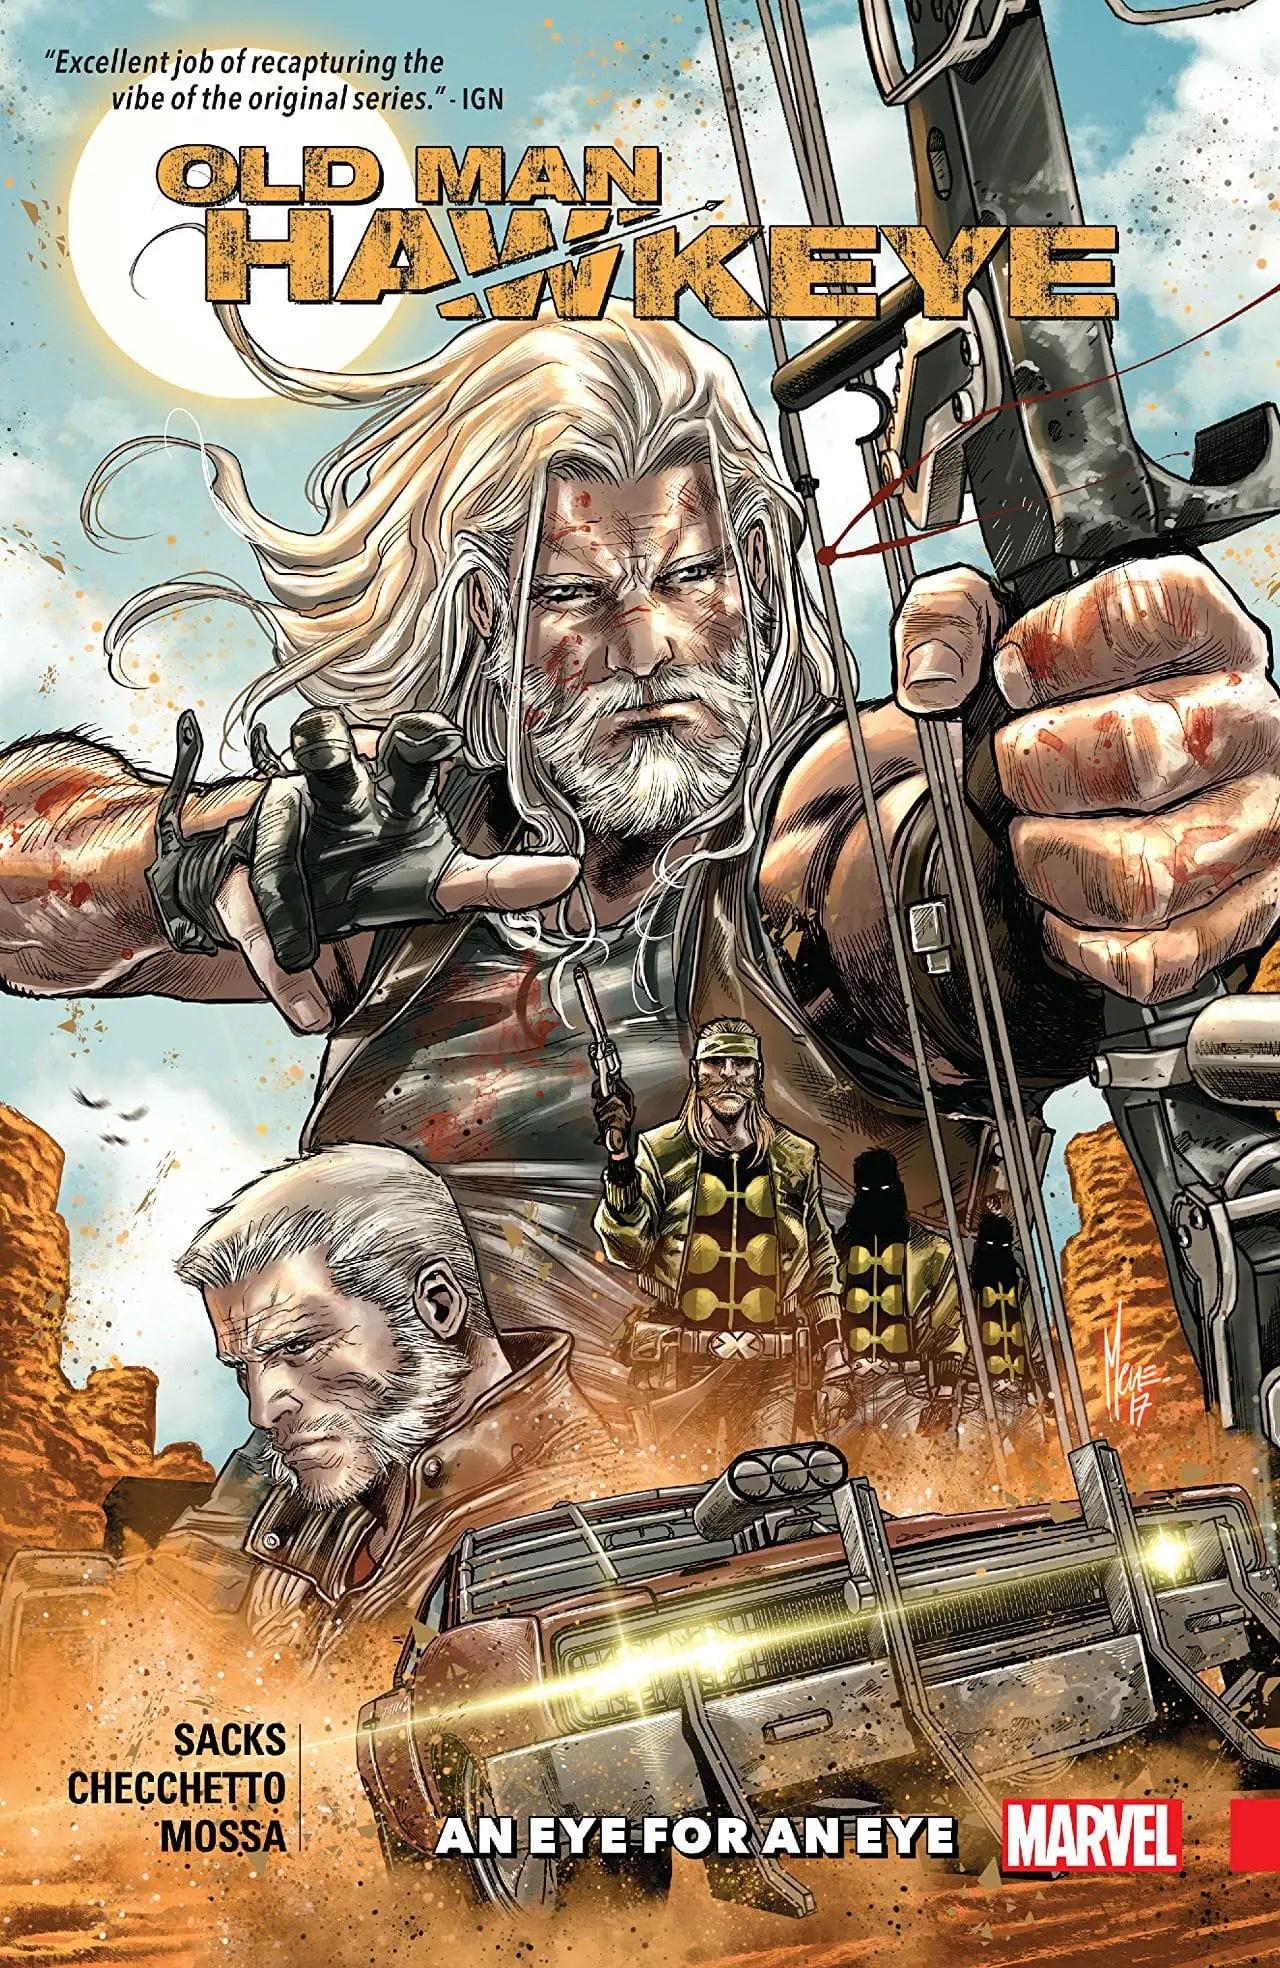 Old Man Hawkeye Vol. 1: An Eye For an Eye Review